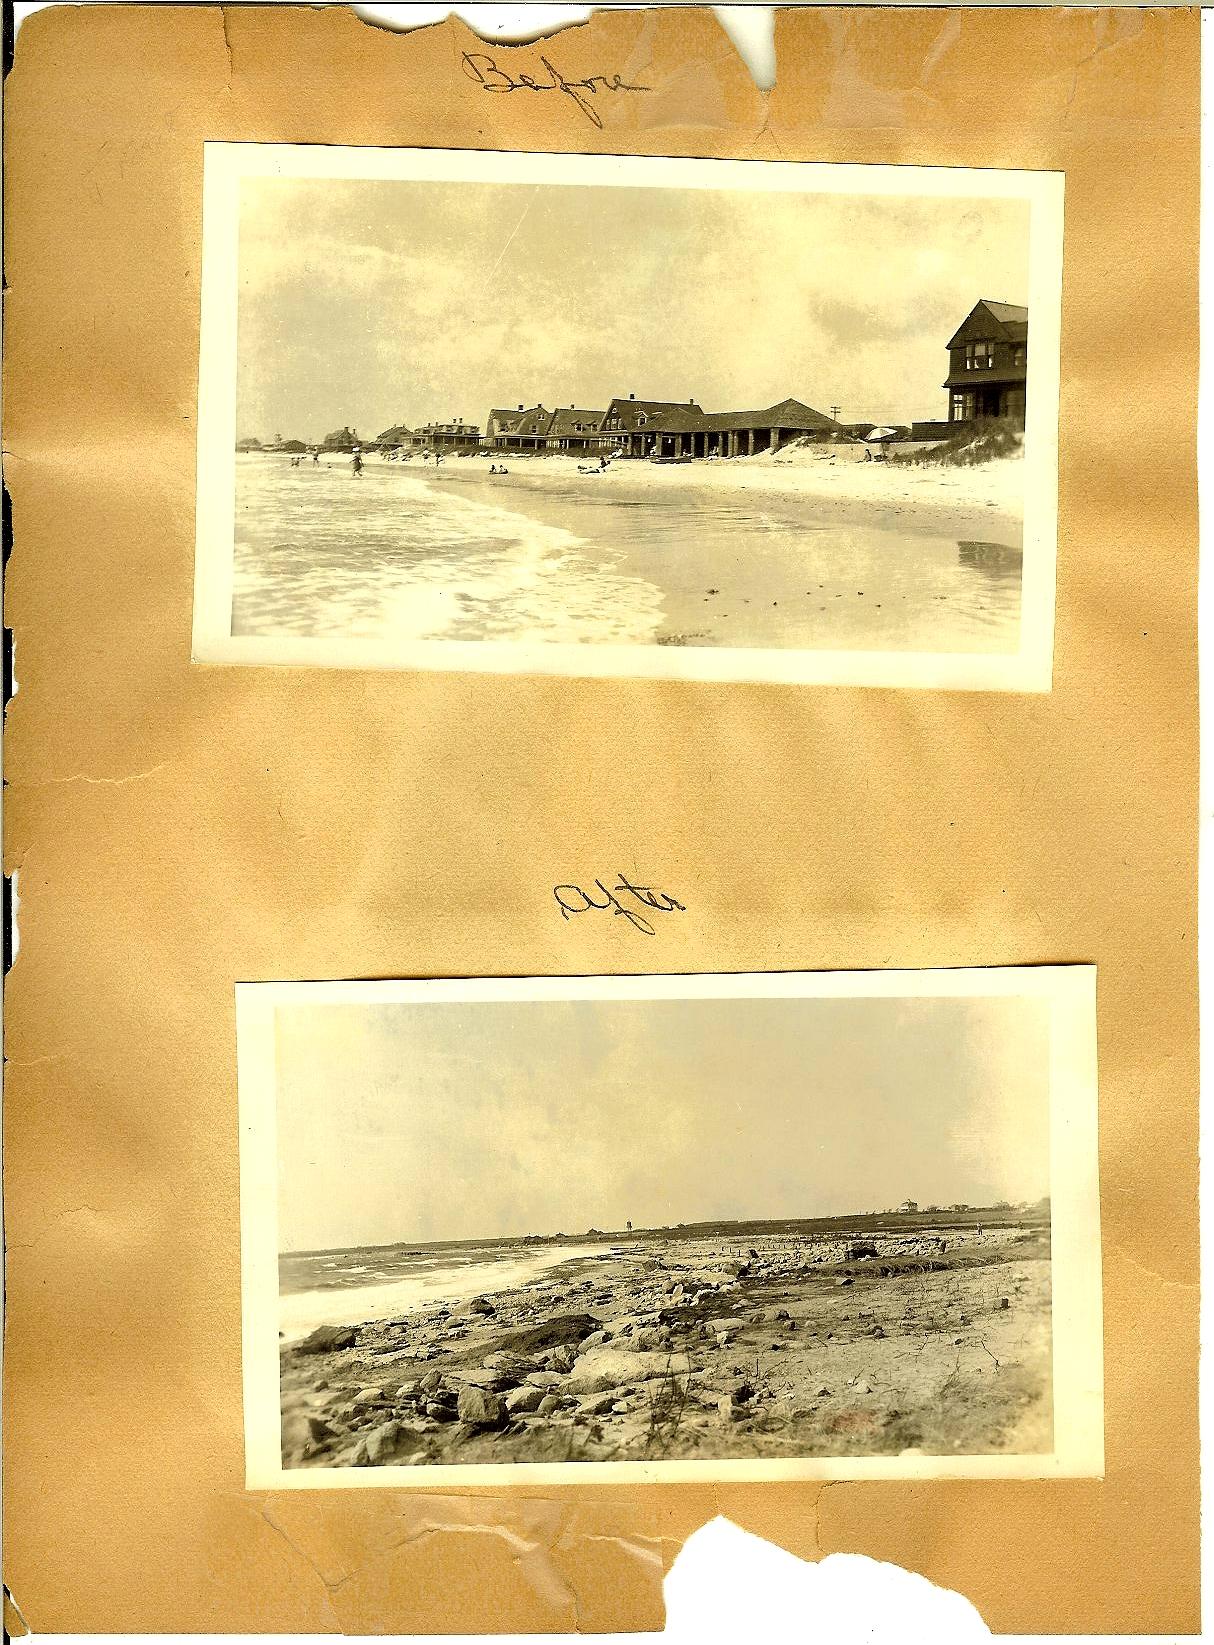 The 1938 Hurricane photos p24